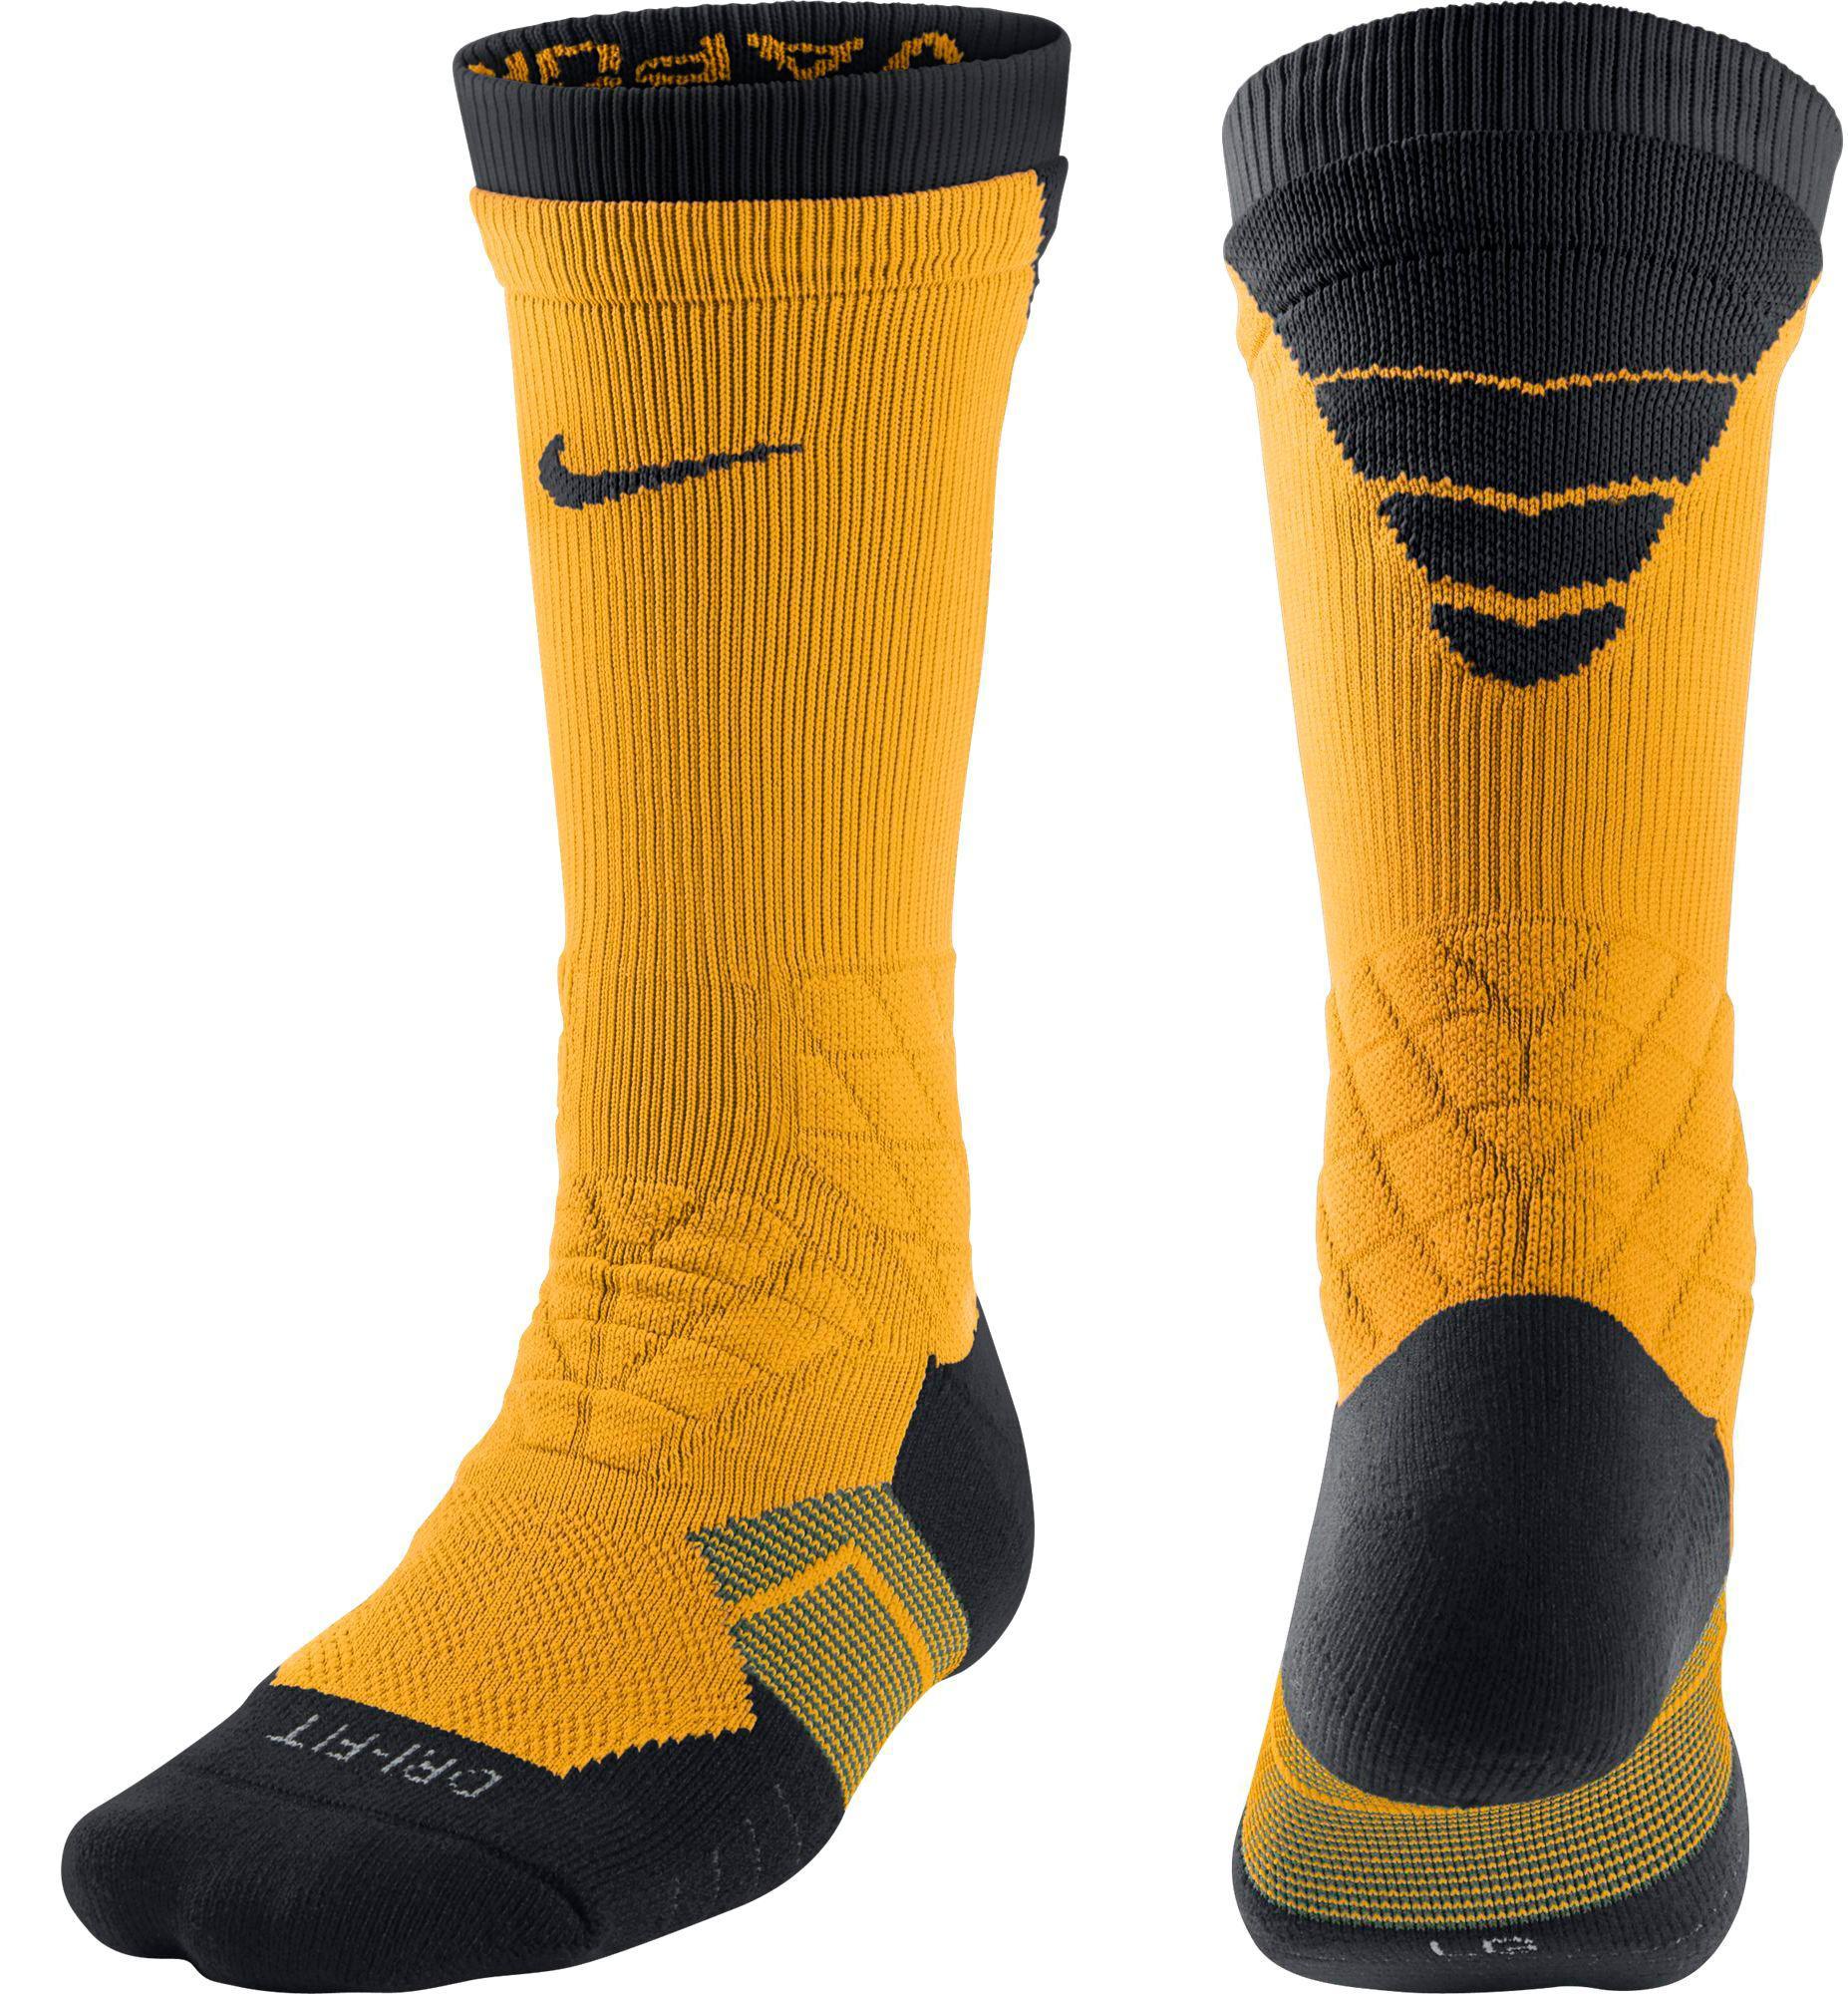 4b1c7b97295e Nike - Yellow Dri-fit 2.0 Vapor Elite Crew Football Socks for Men - Lyst